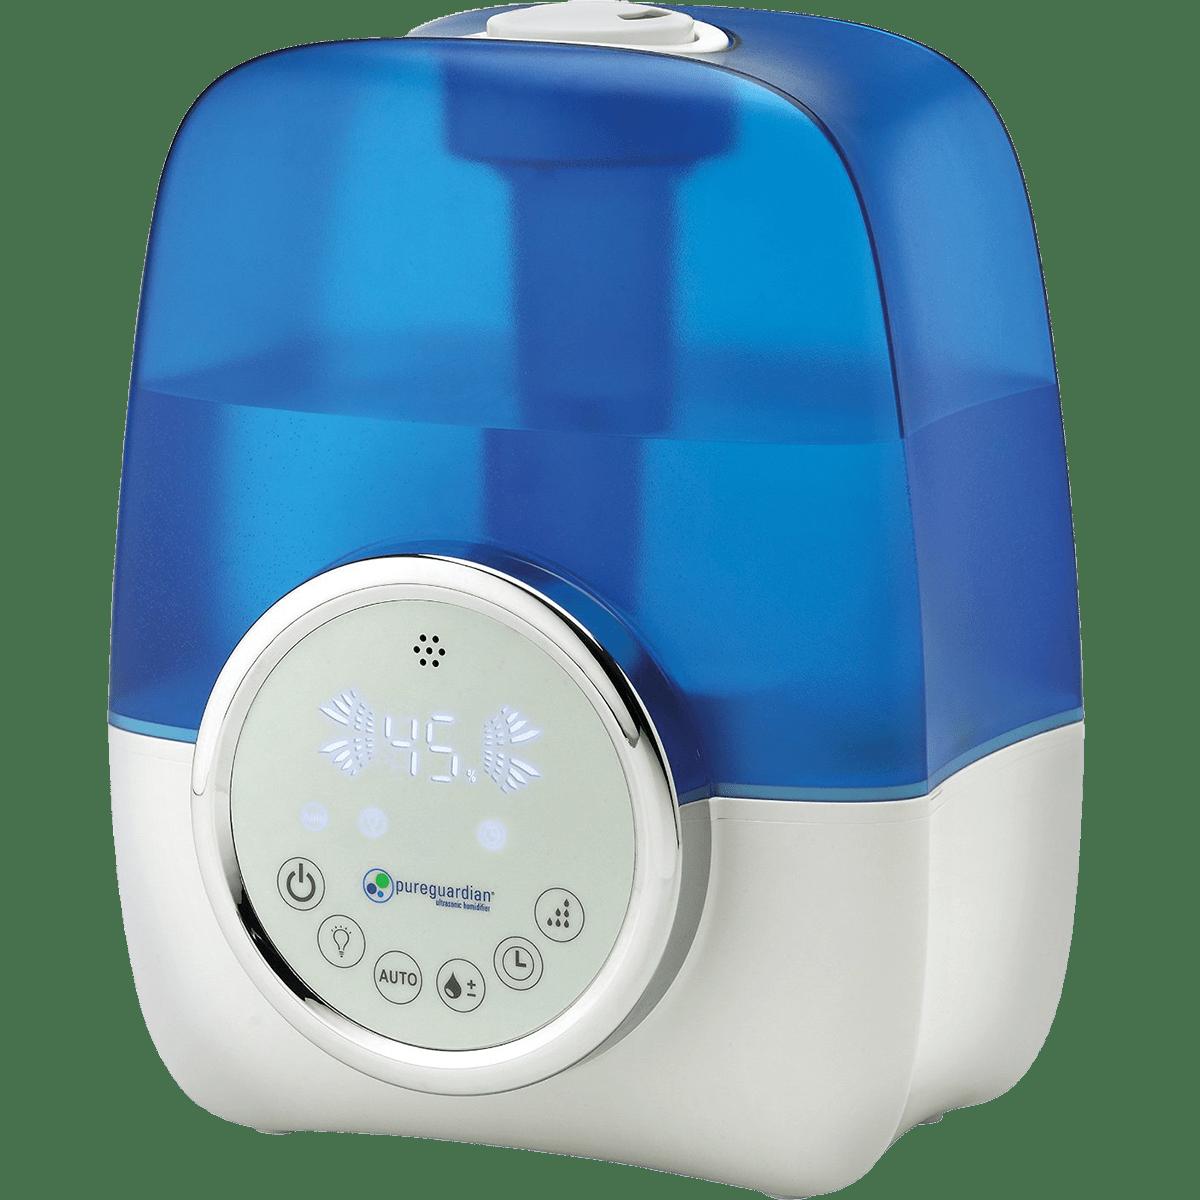 PureGuardian H1250 100-Hour Ultrasonic Cool Mist Humidifier with Digital Smart Mist Sensor ge5658